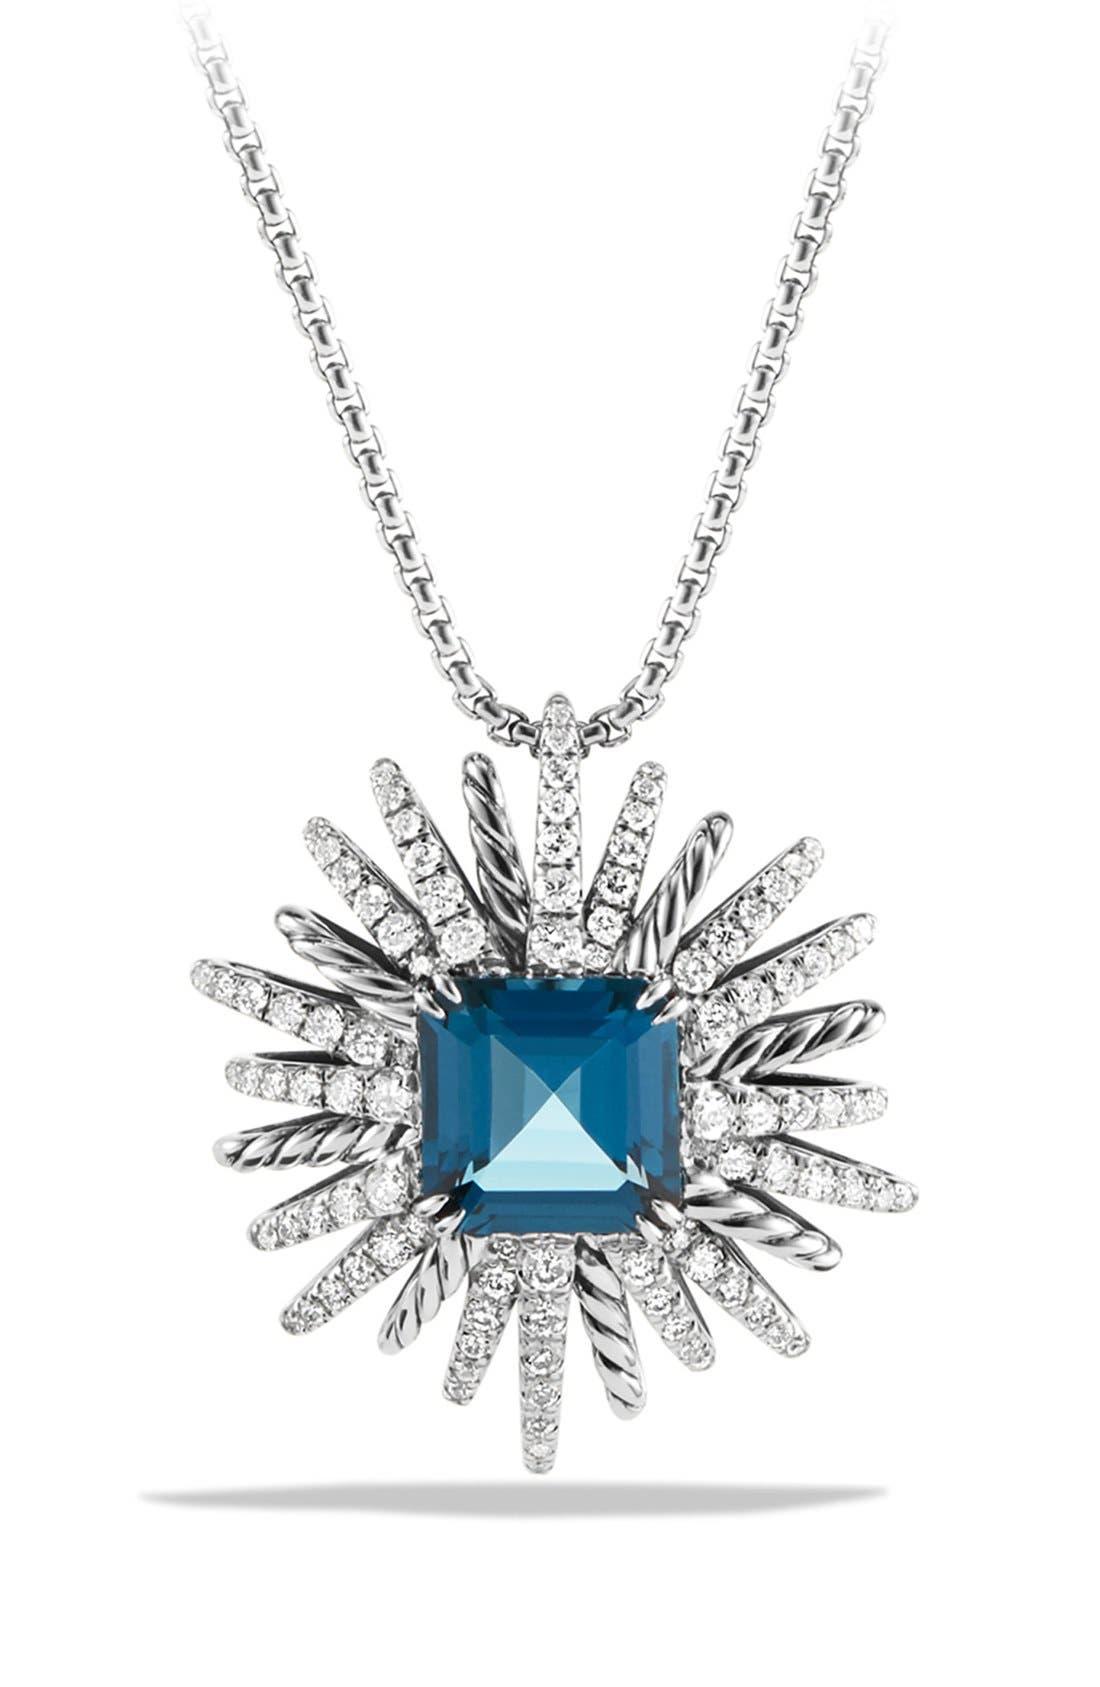 DAVID YURMAN 'Starburst' Necklace with Diamonds in Silver, Main, color, HAMPTON BLUE TOPAZ